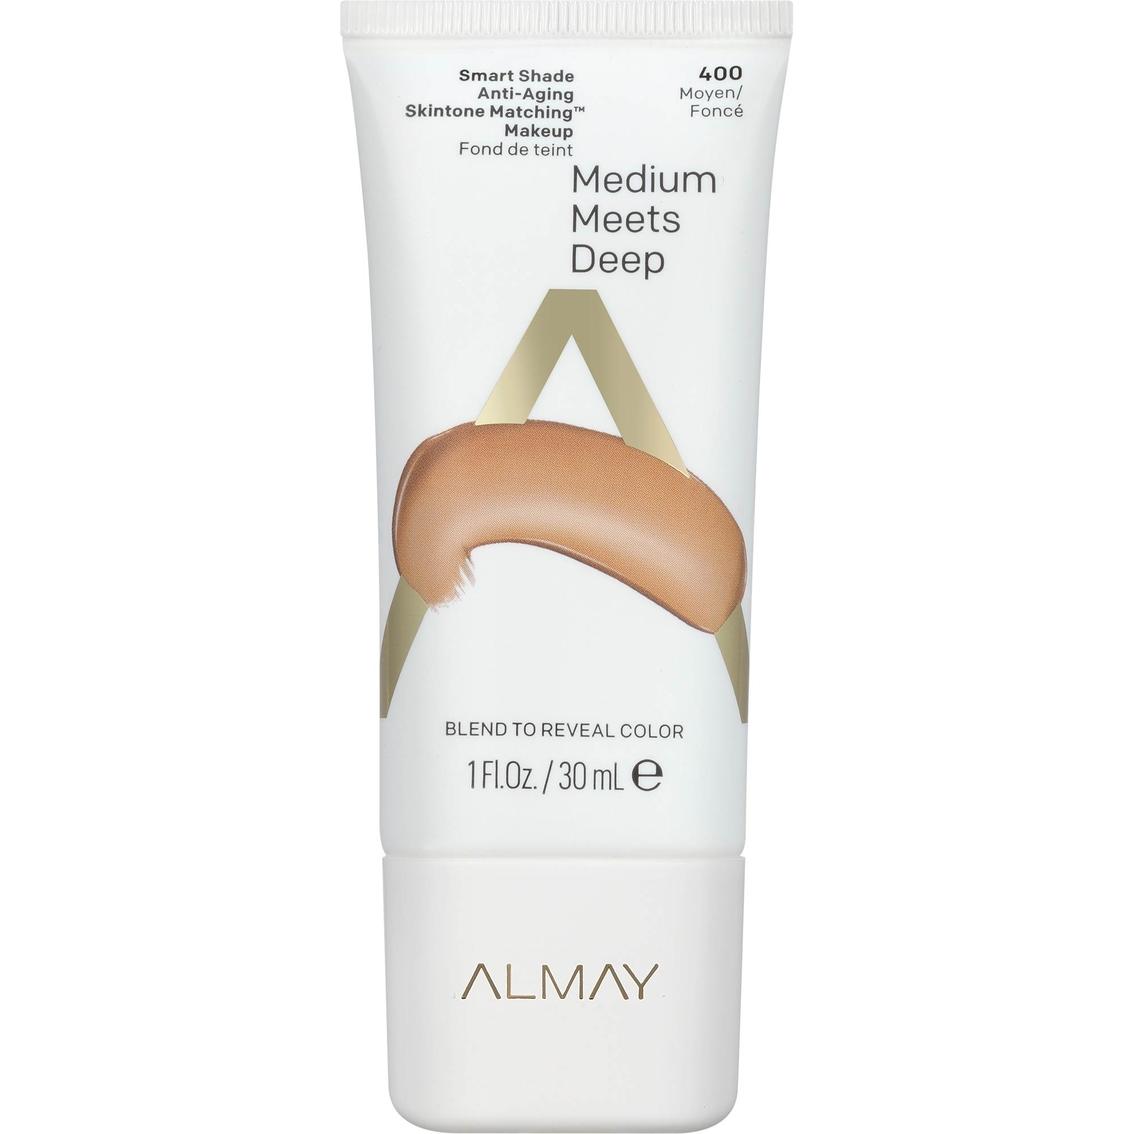 Almay Smart Shade Anti Aging Skintone Matching Makeup